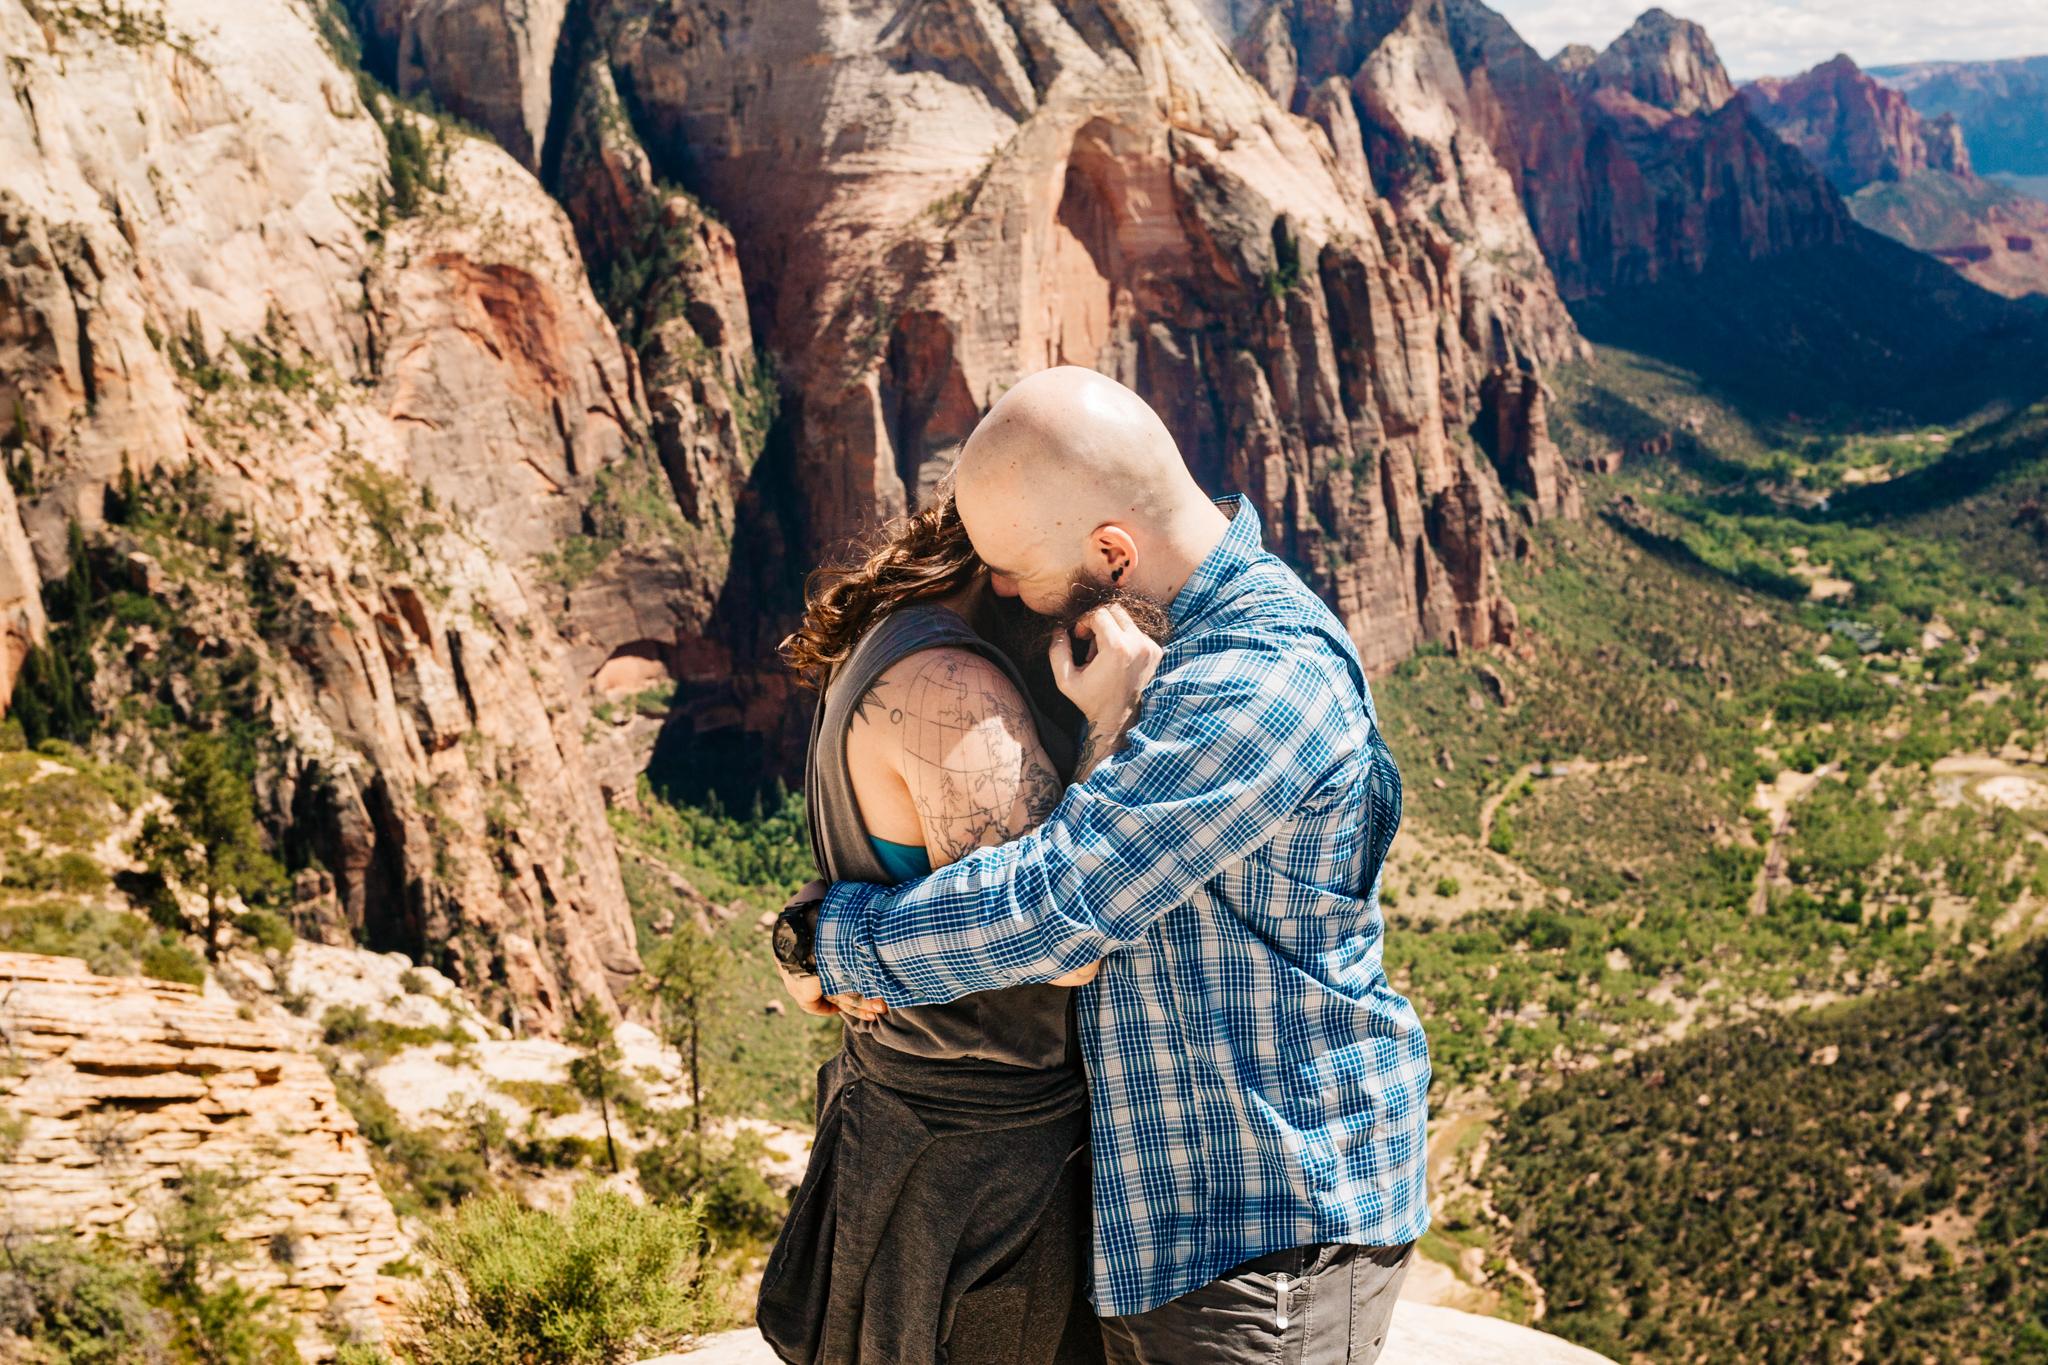 proposal-at-zion-national-park-angels-landing-utah-adventure-photographer-andrea-van-orsouw-photography.jpg